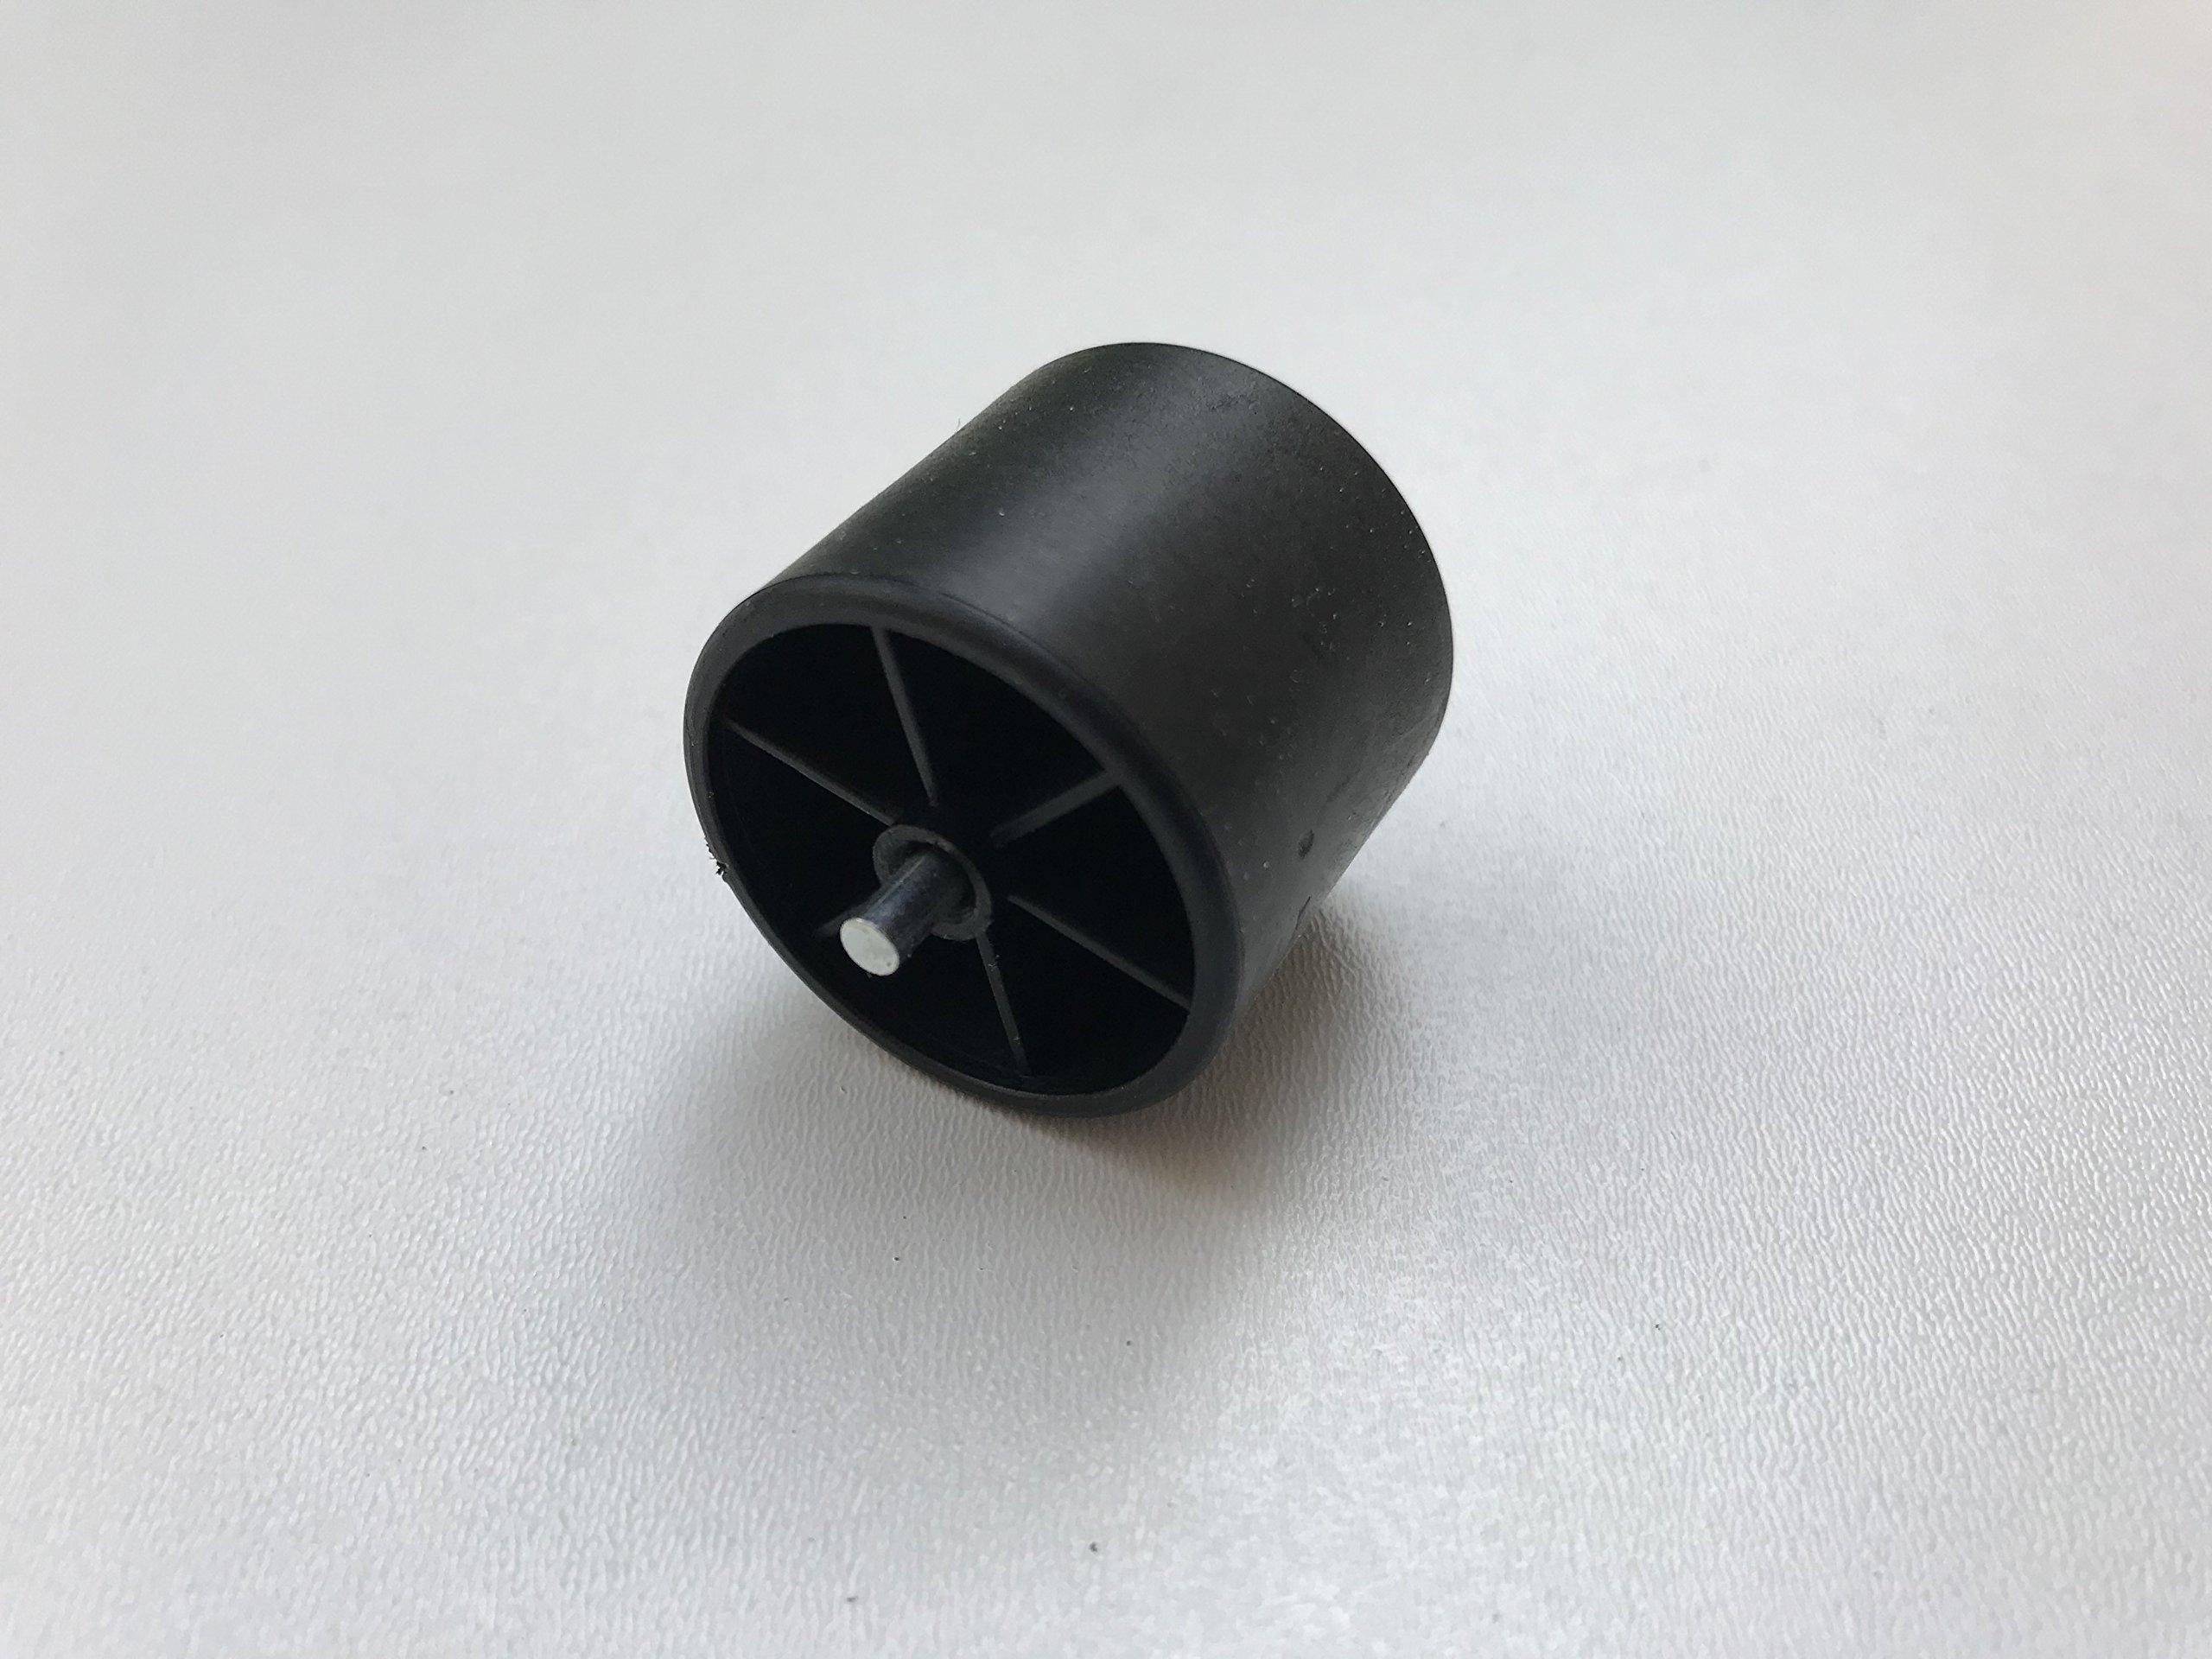 Skate Wheel Plastic Dia 28 mm for Roller Track Flow Rail Conveyor Black ESD (Pack of 10) by SKX Material Handling (Image #1)